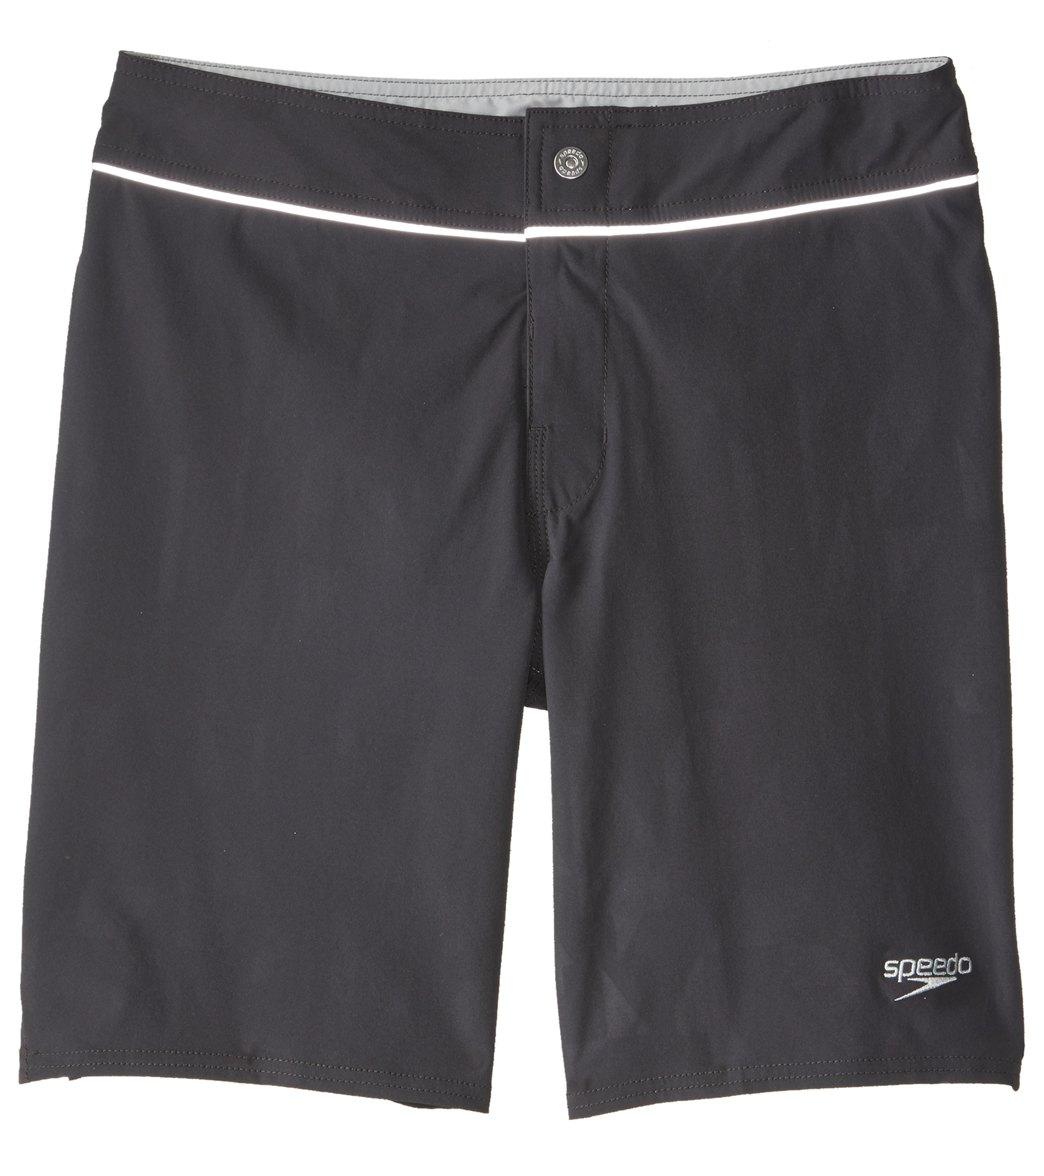 Black Size 32 Speedo Mens Stretch Tech Boardshort Workout /& Swim Trunks